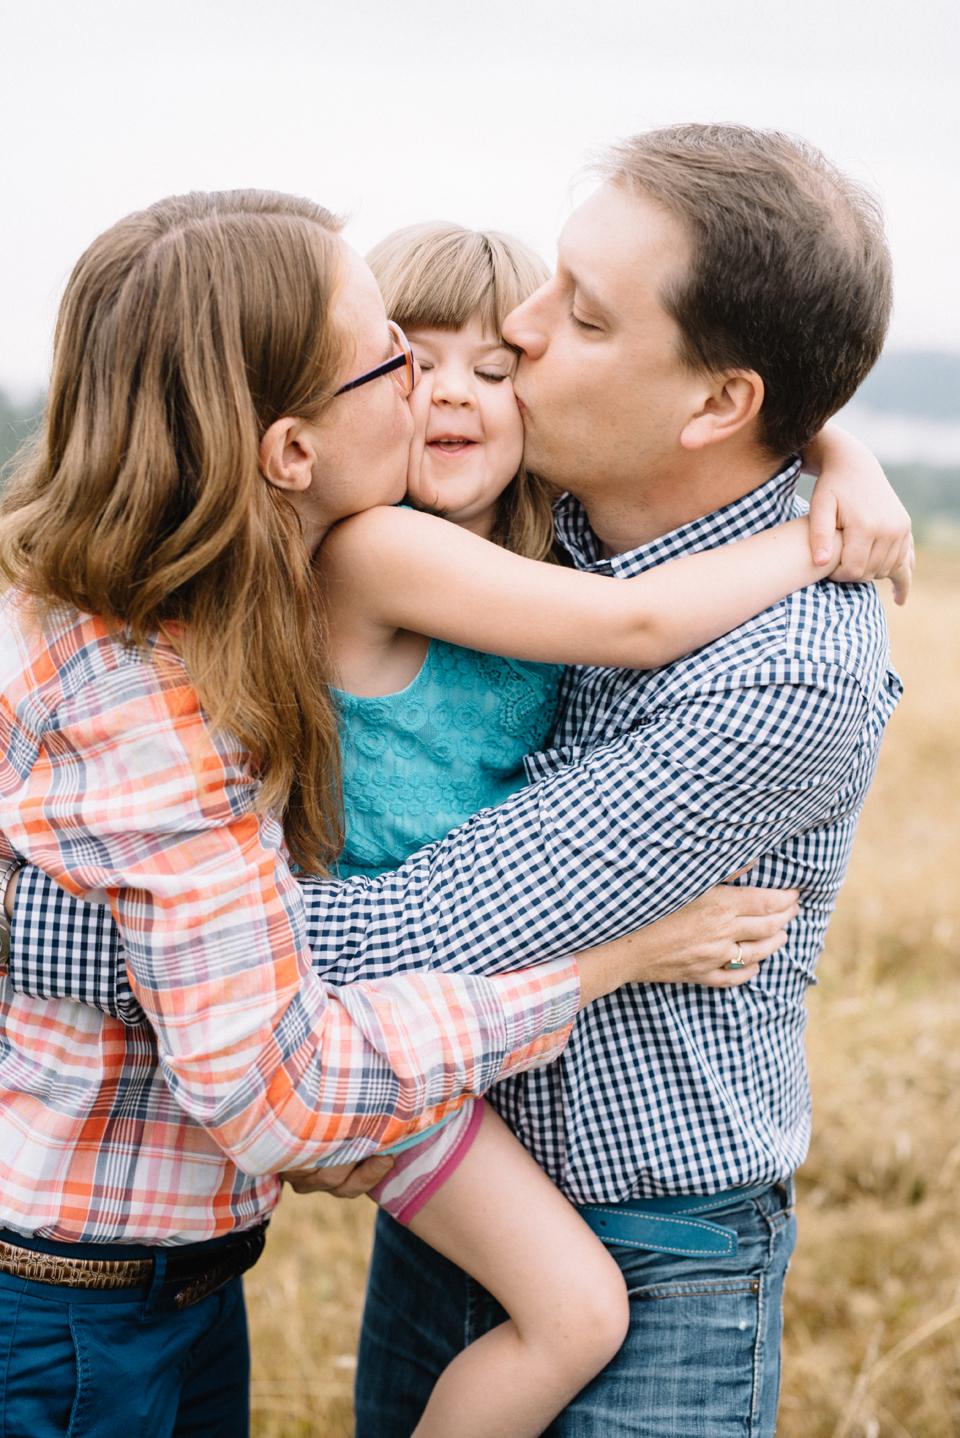 duvall-family-photographer-andre-doughterty-farmsteadjtpa00416.JPG